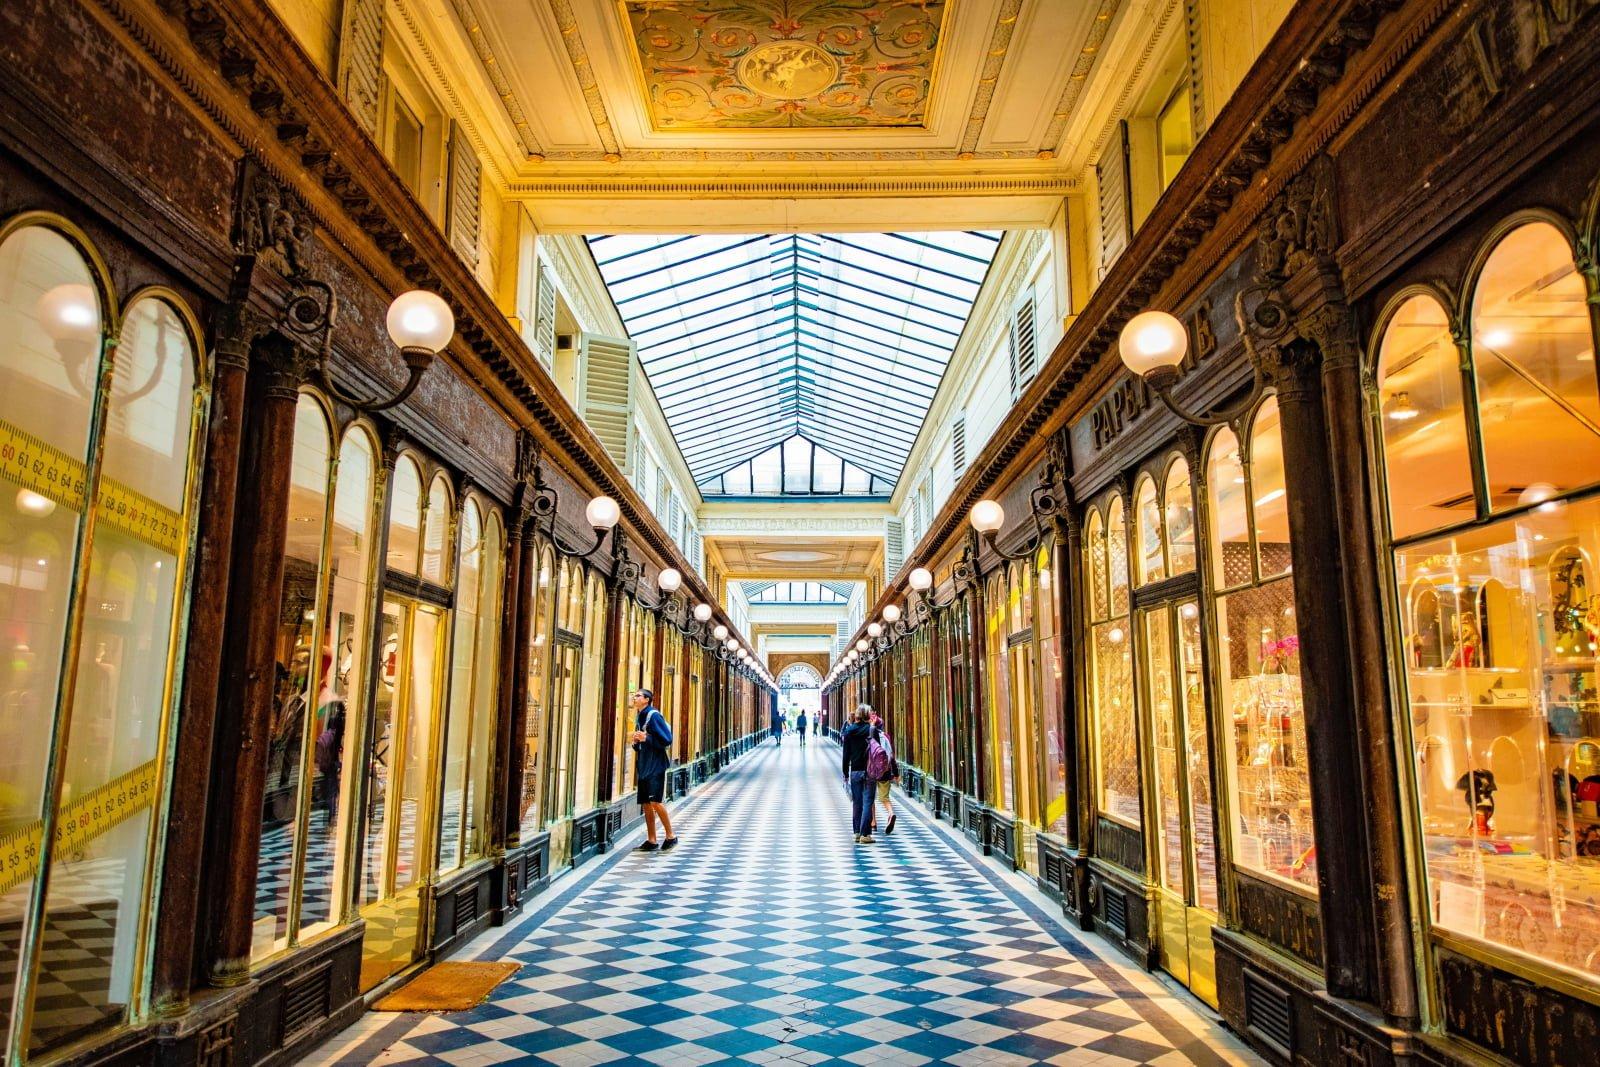 Paryska architektura fot. EPA/CAROLINE BLUMBERG